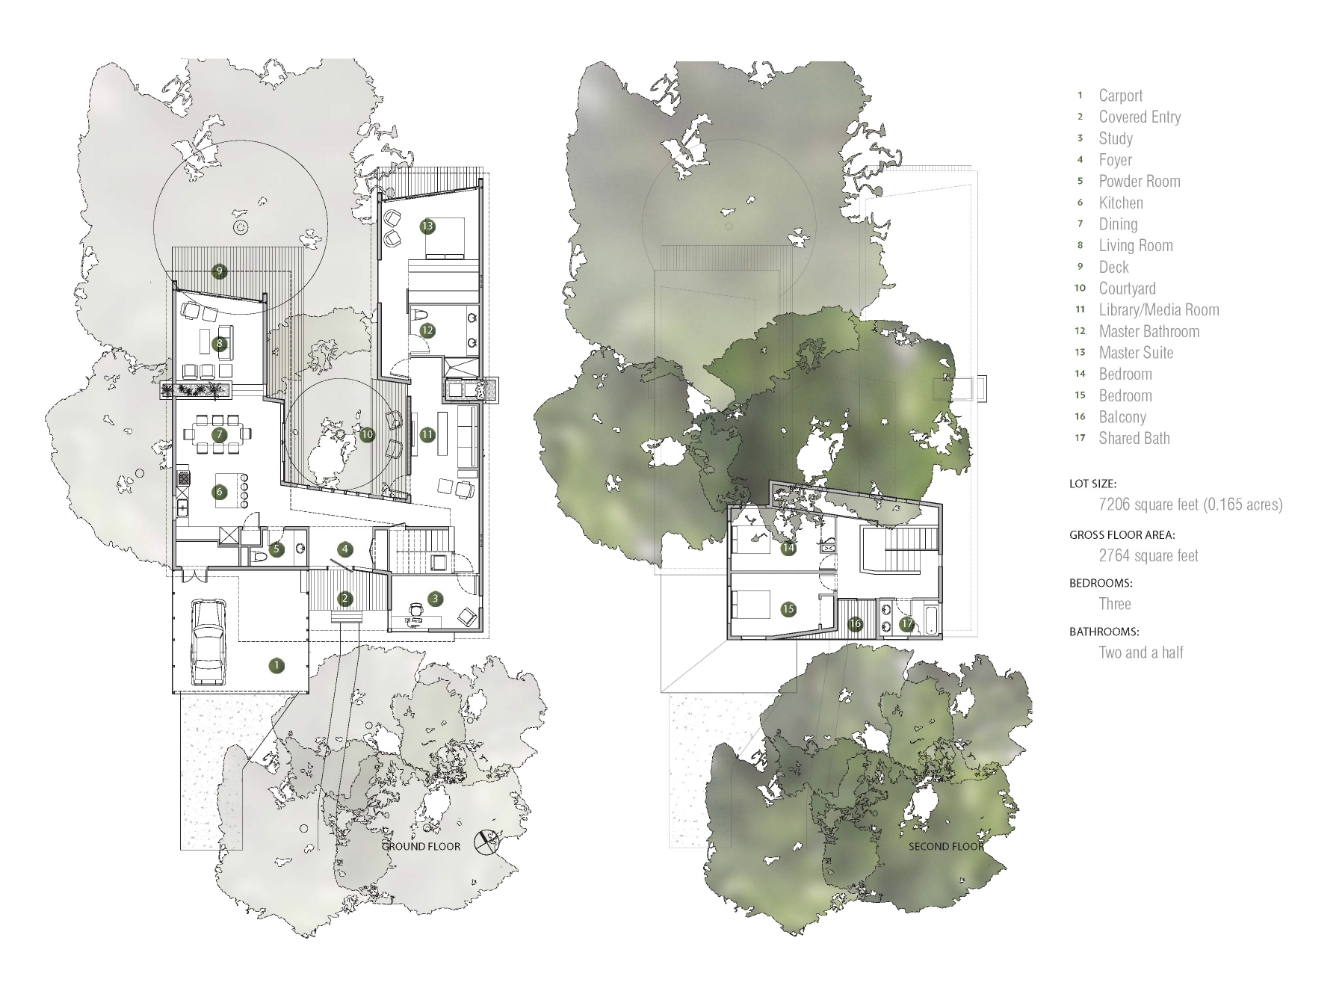 2014_0328 Matt Fajkus MF Architecture Sacramento Tree Hug House_Page_2.jpg